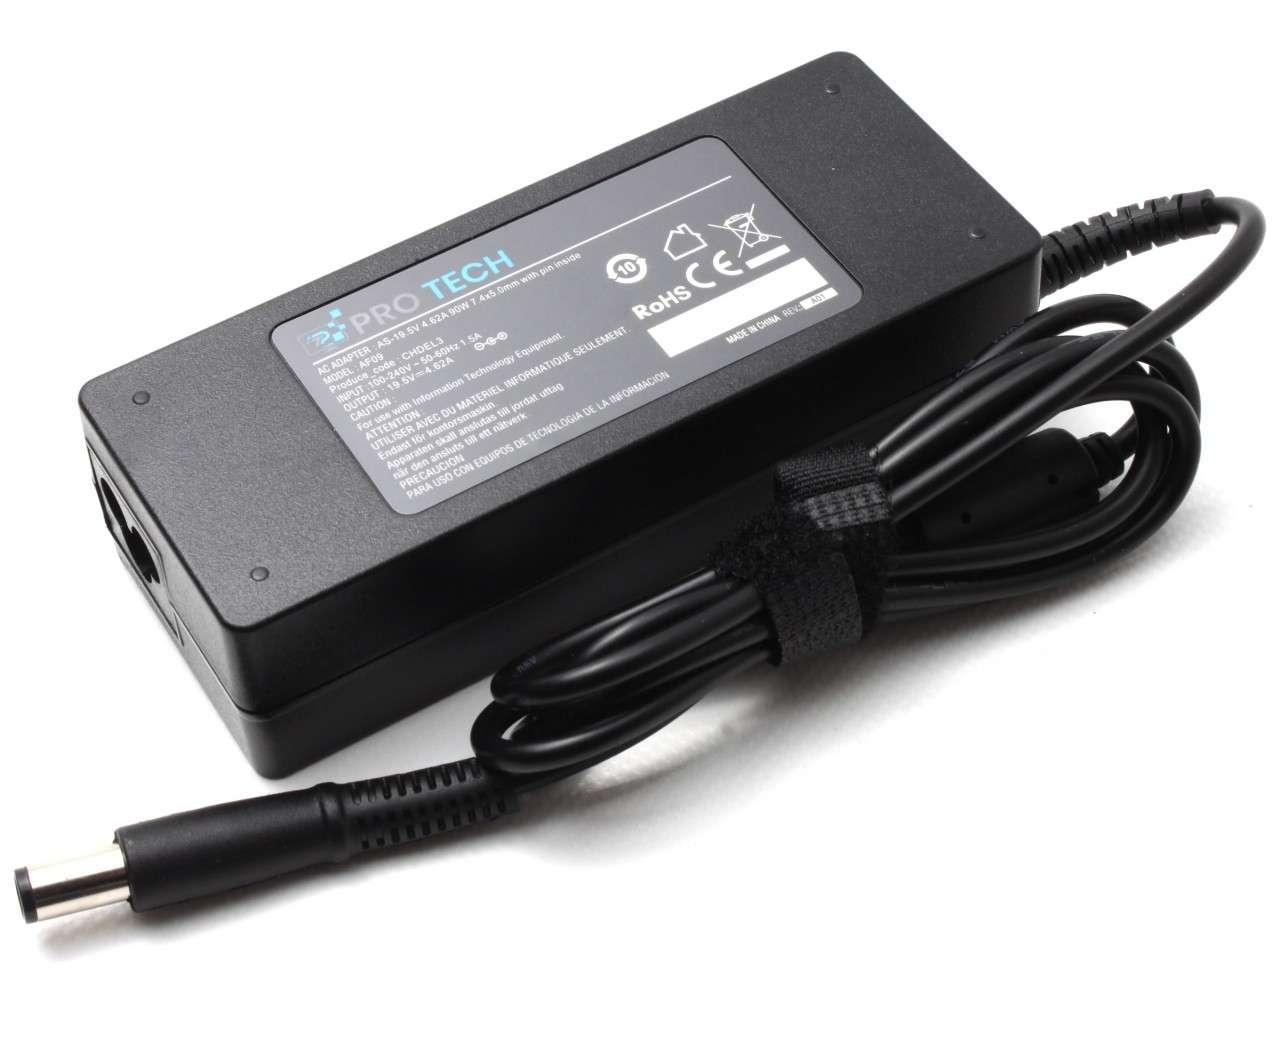 Incarcator Dell Inspiron E1405 Replacement imagine powerlaptop.ro 2021